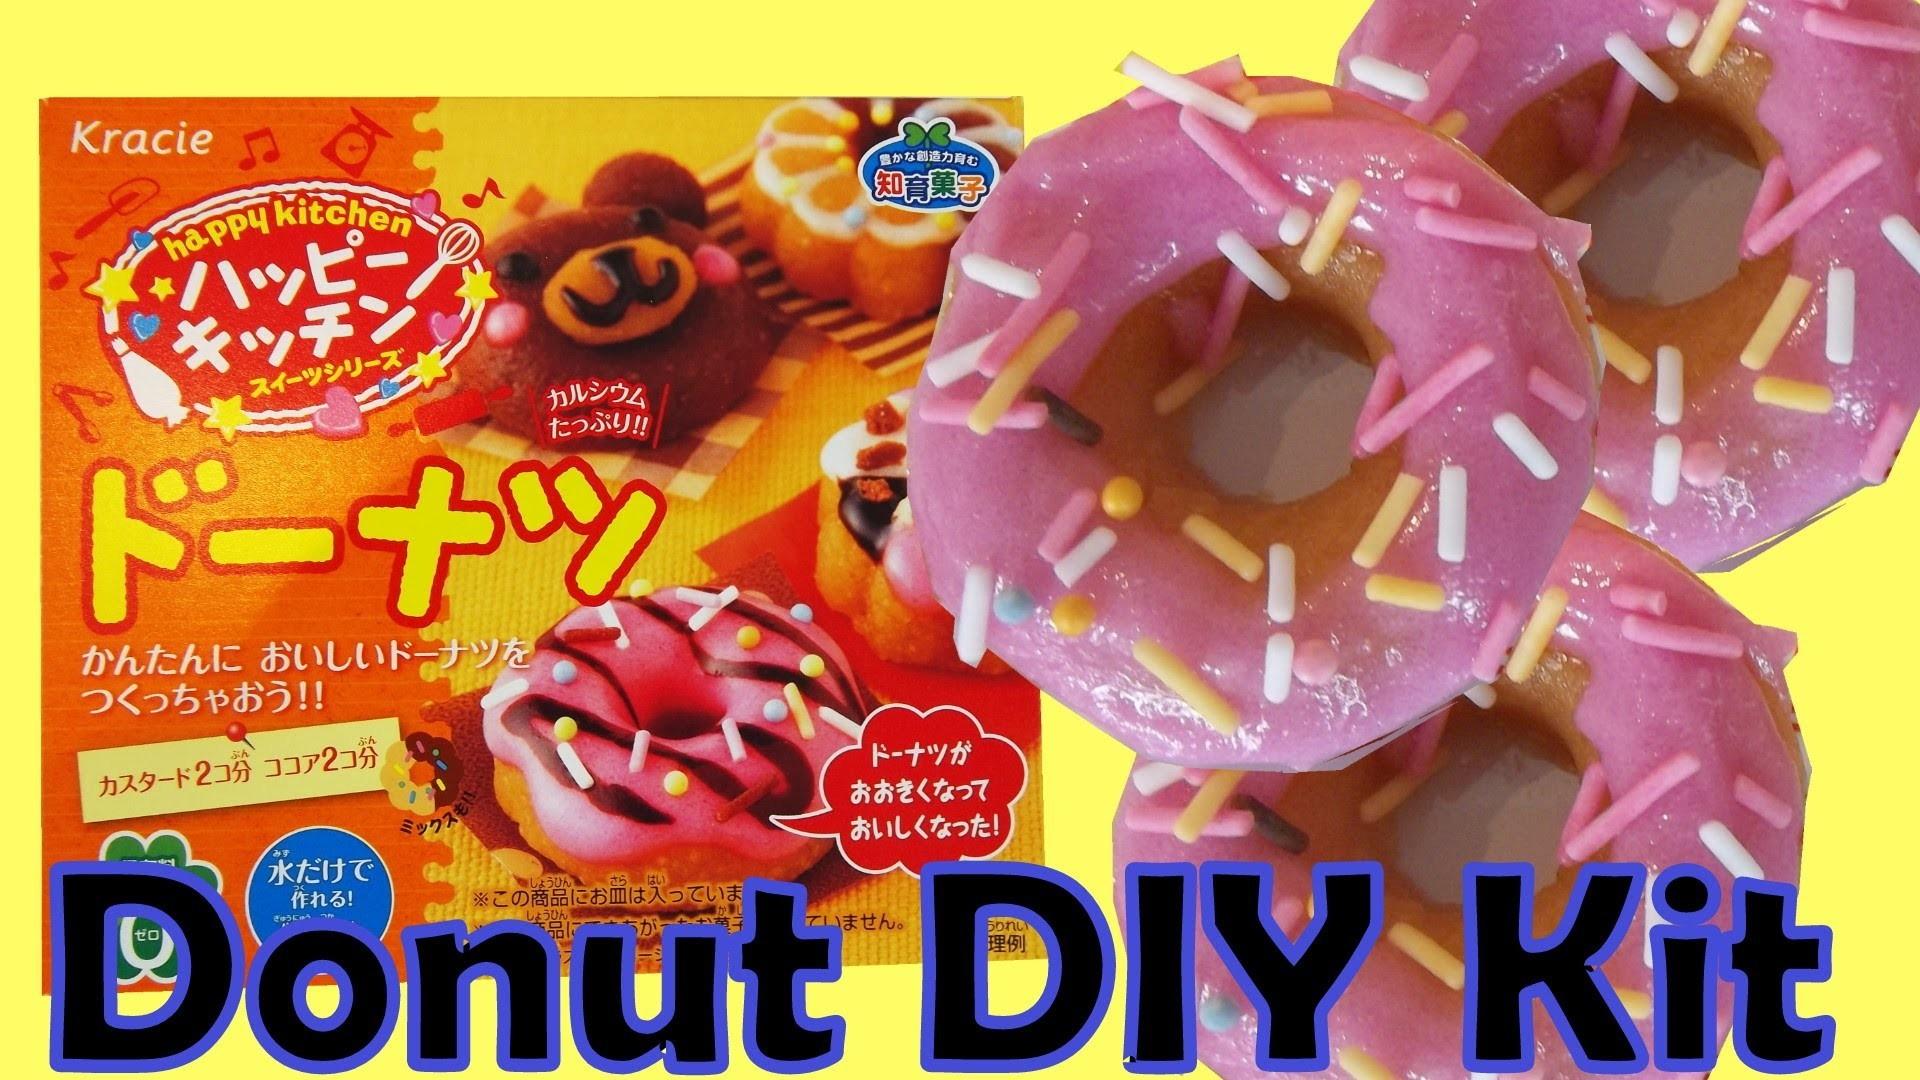 Kracie Popin' DIY Donut Happy Kitchen Candy Doughnut Kit